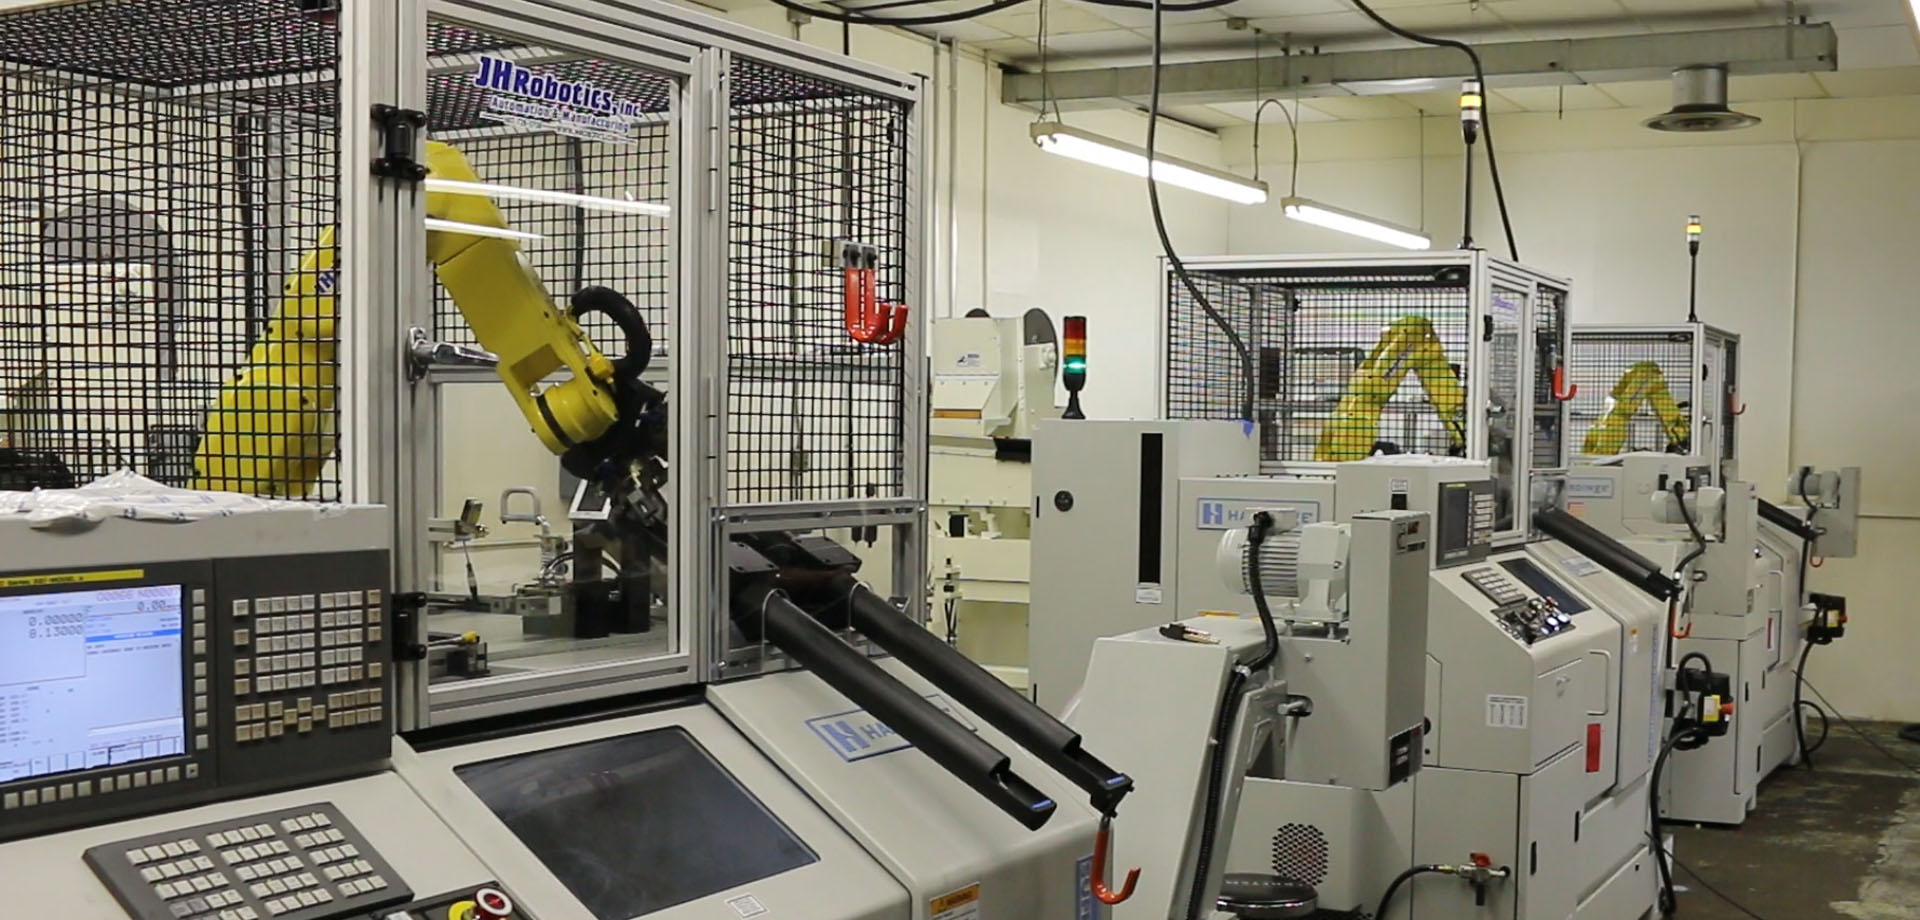 Machine Tending Robots Jhr 150 Jh Robotics Inc